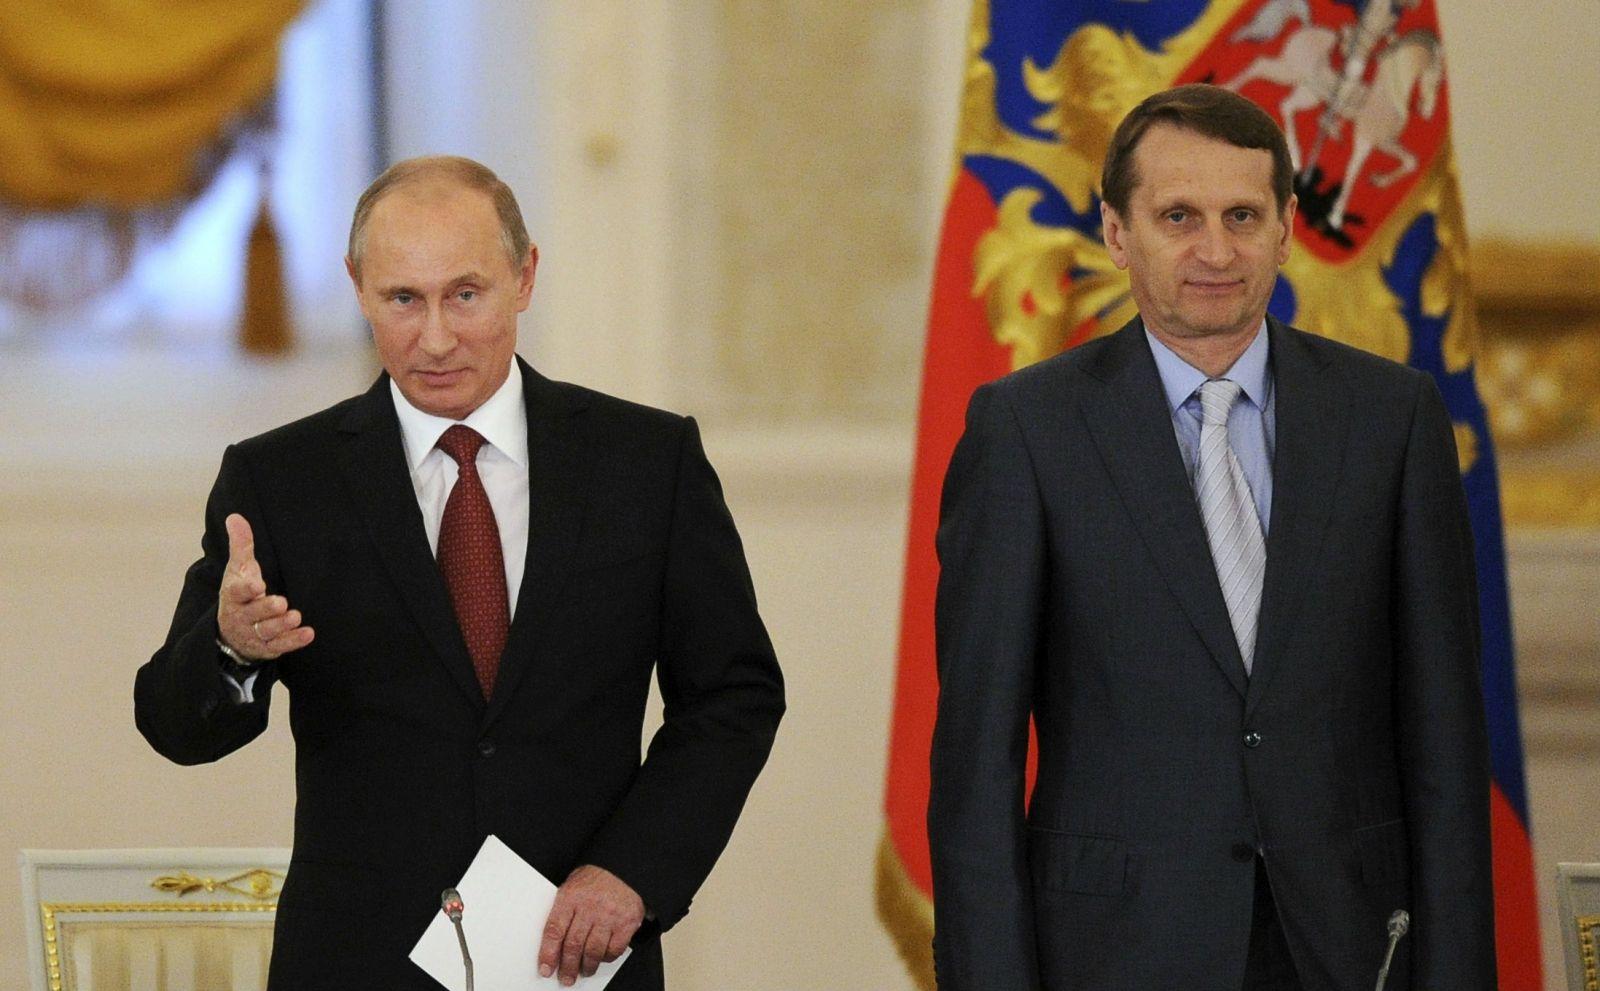 Putin ally warns of US aggravation